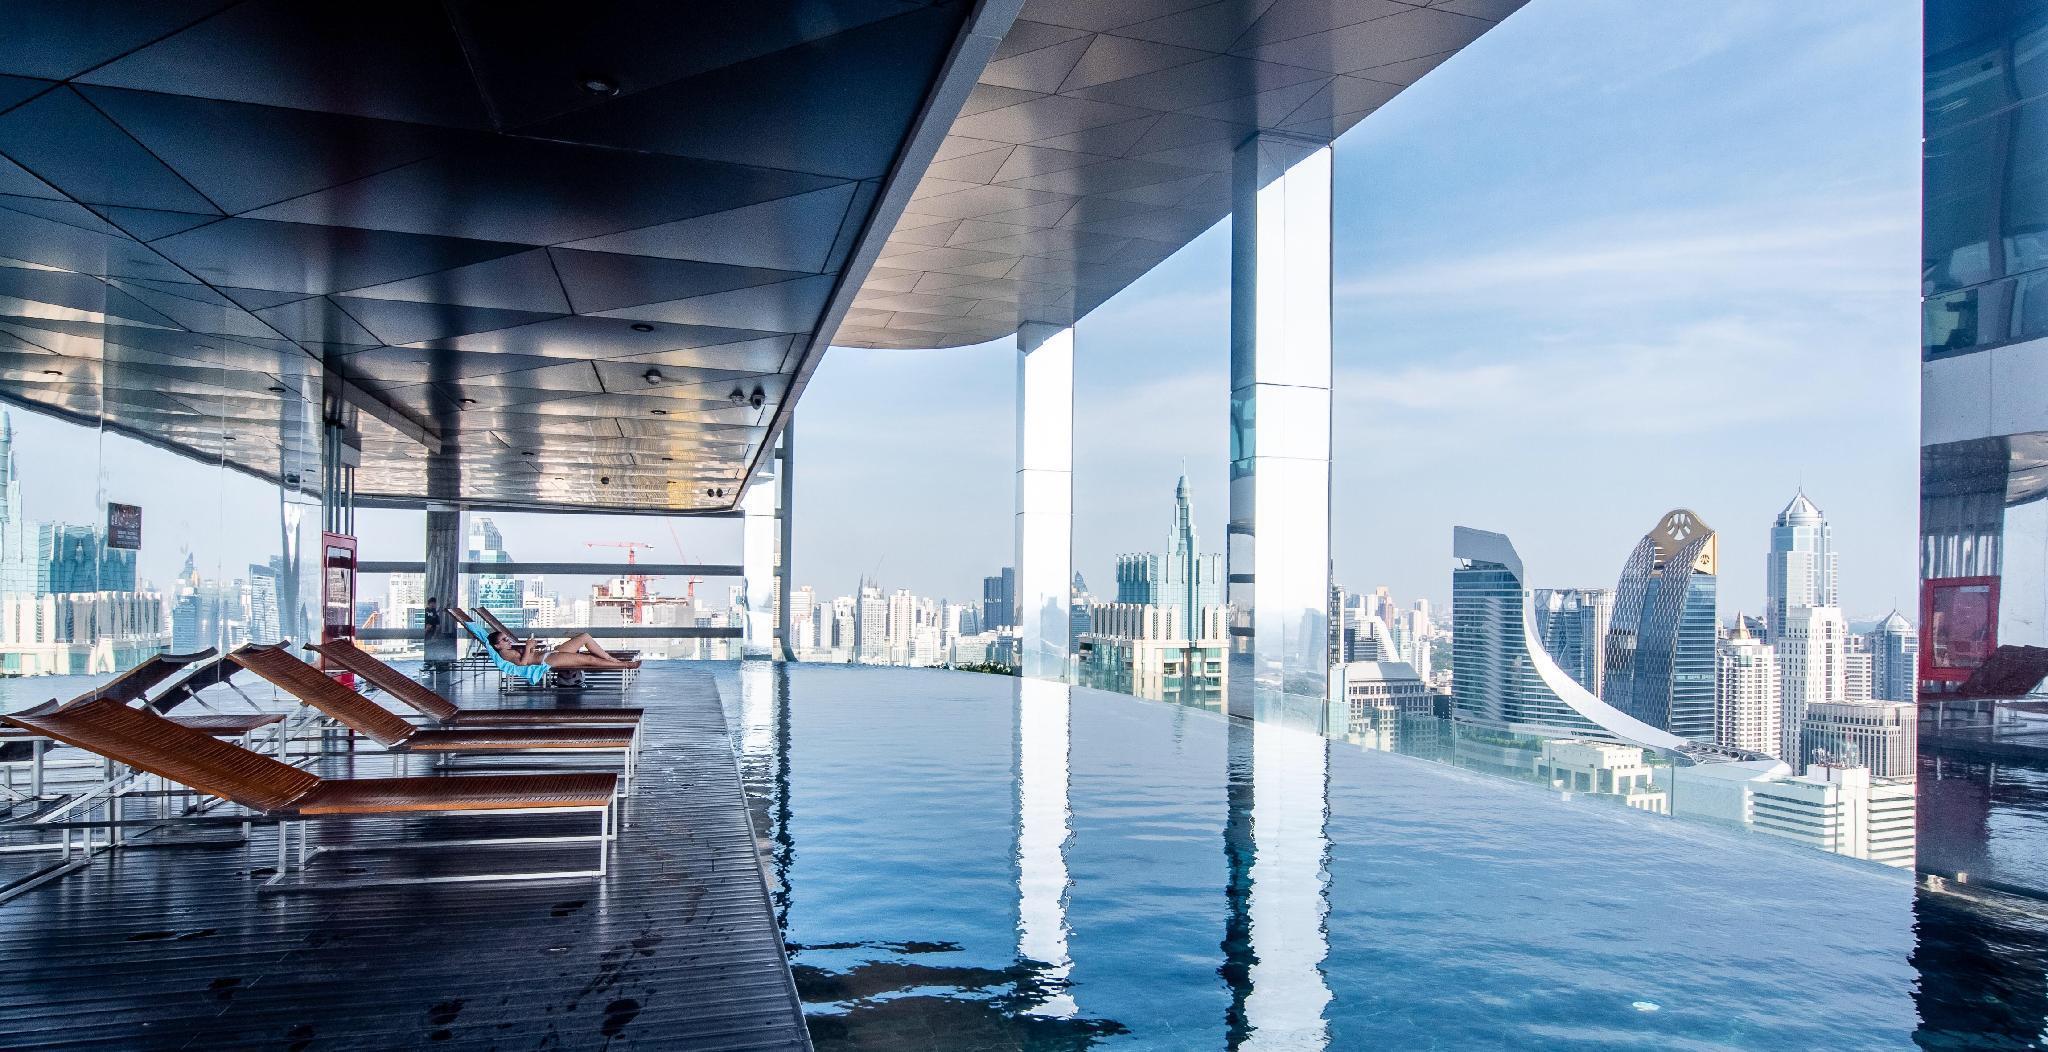 360 degree infinity pool in the city centre อพาร์ตเมนต์ 2 ห้องนอน 2 ห้องน้ำส่วนตัว ขนาด 73 ตร.ม. – สยาม